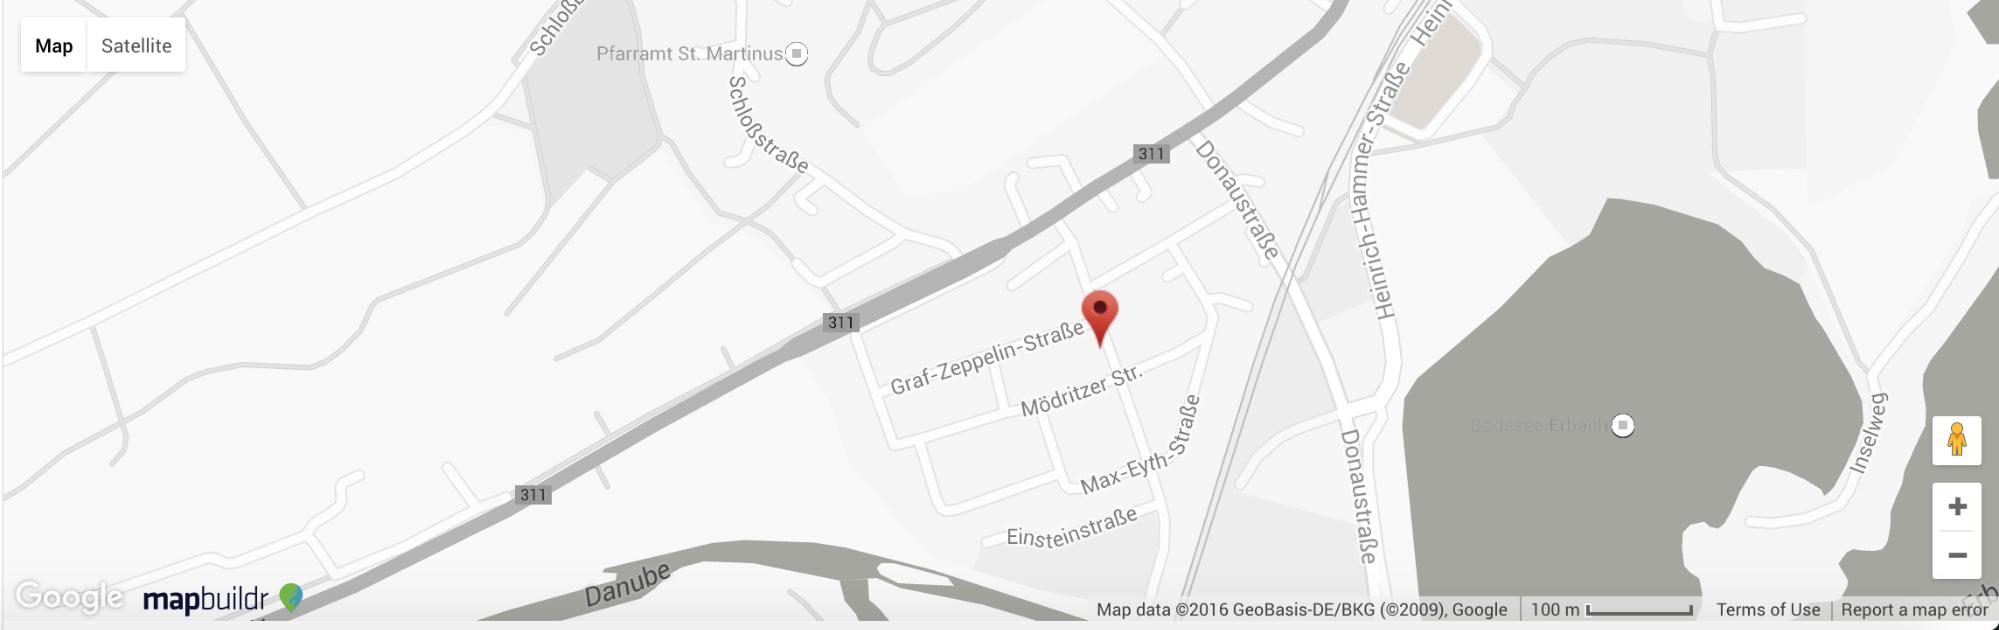 The MapBuilder-customized map the salon website features